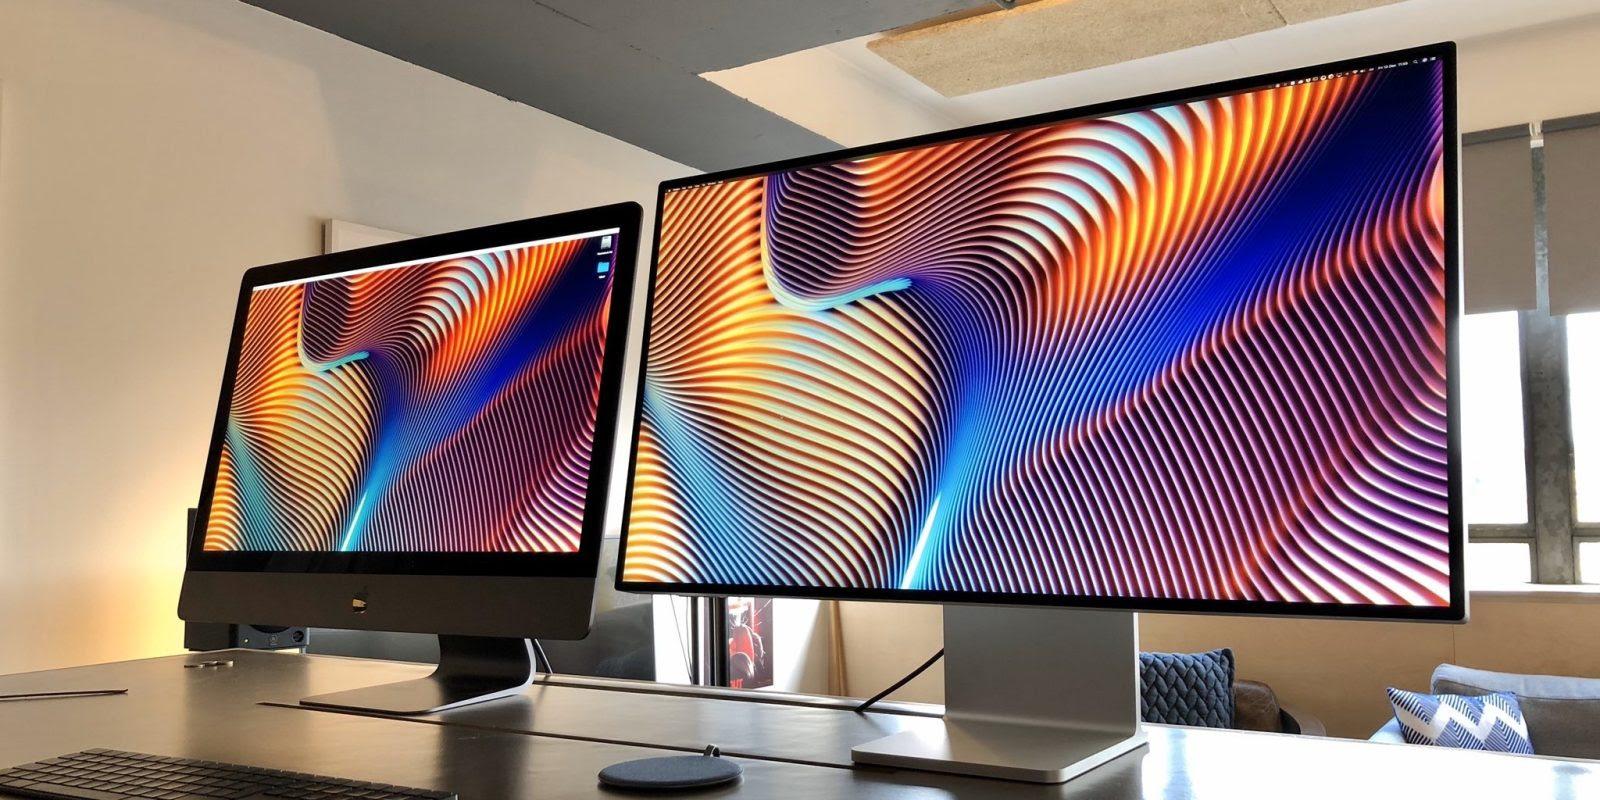 Mac Monitor Costs